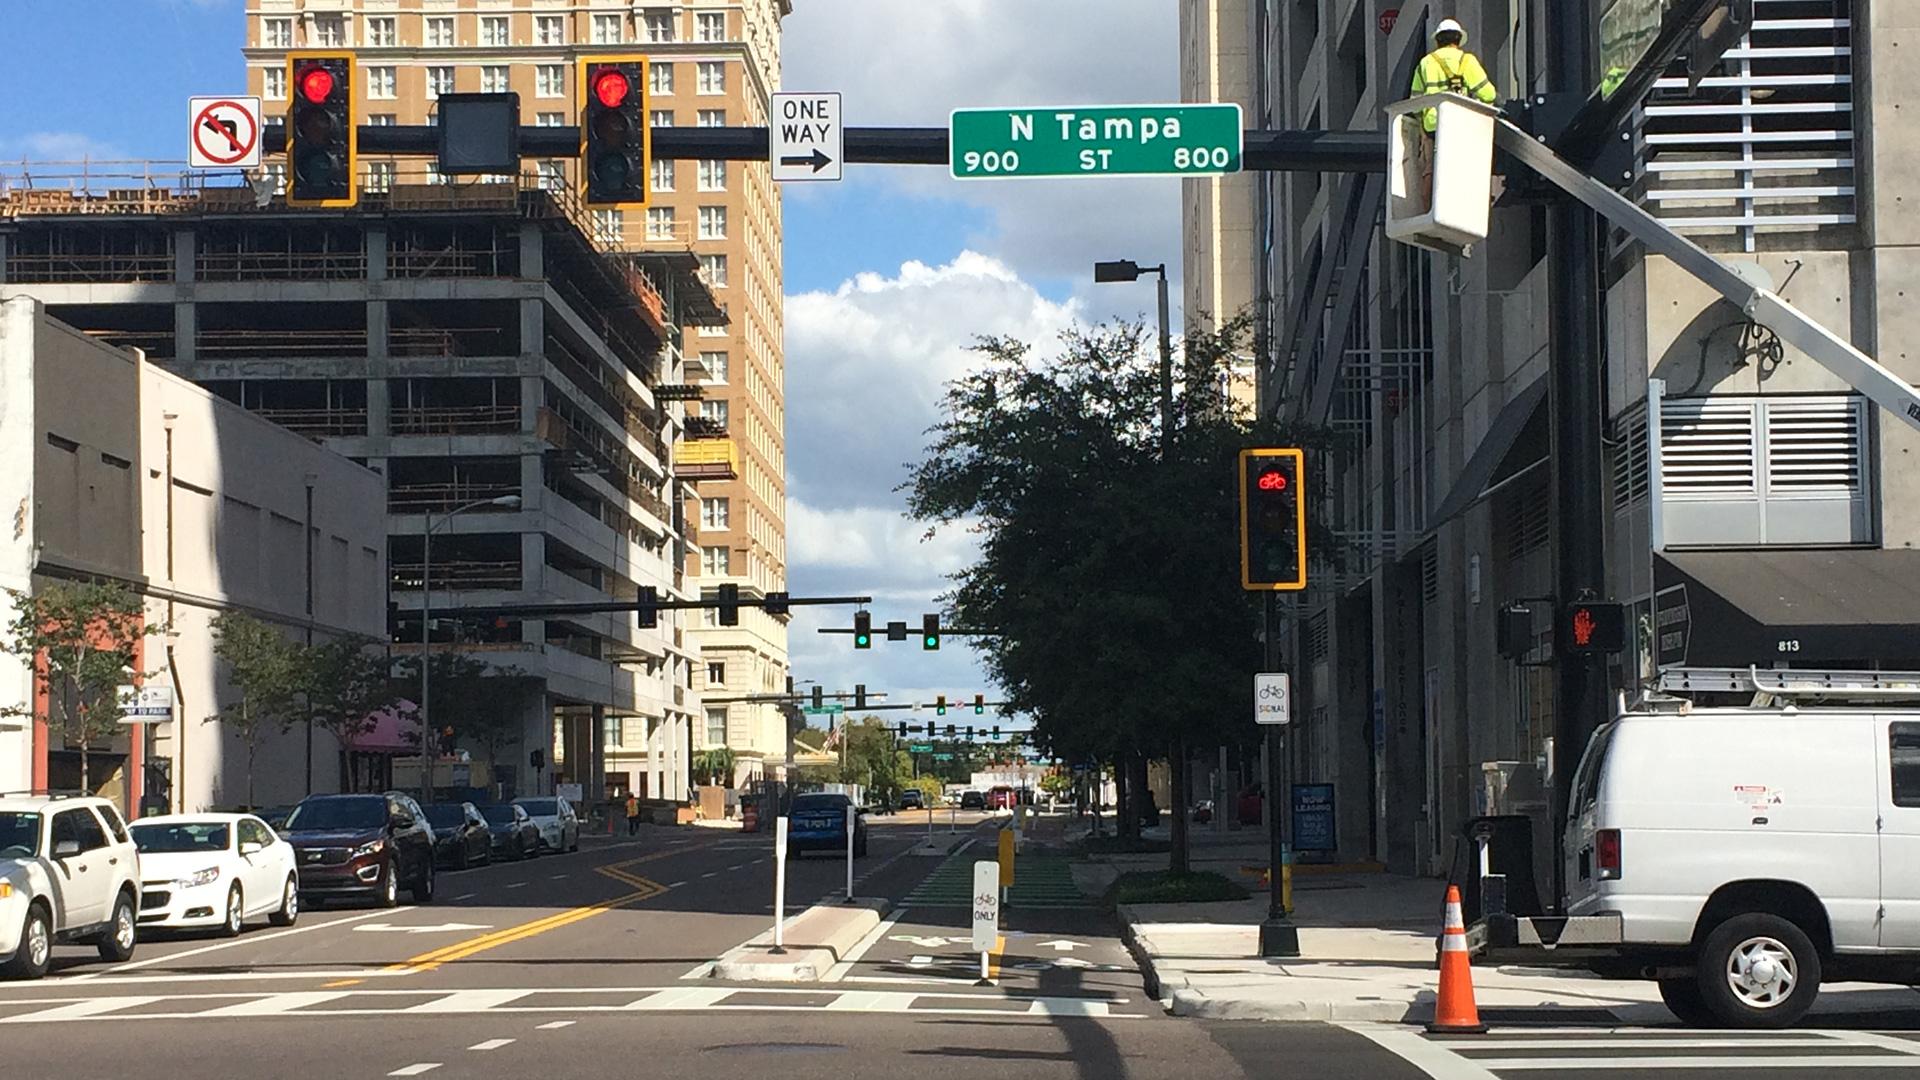 Cass Street Protected Bike Lane in Tampa, Florida